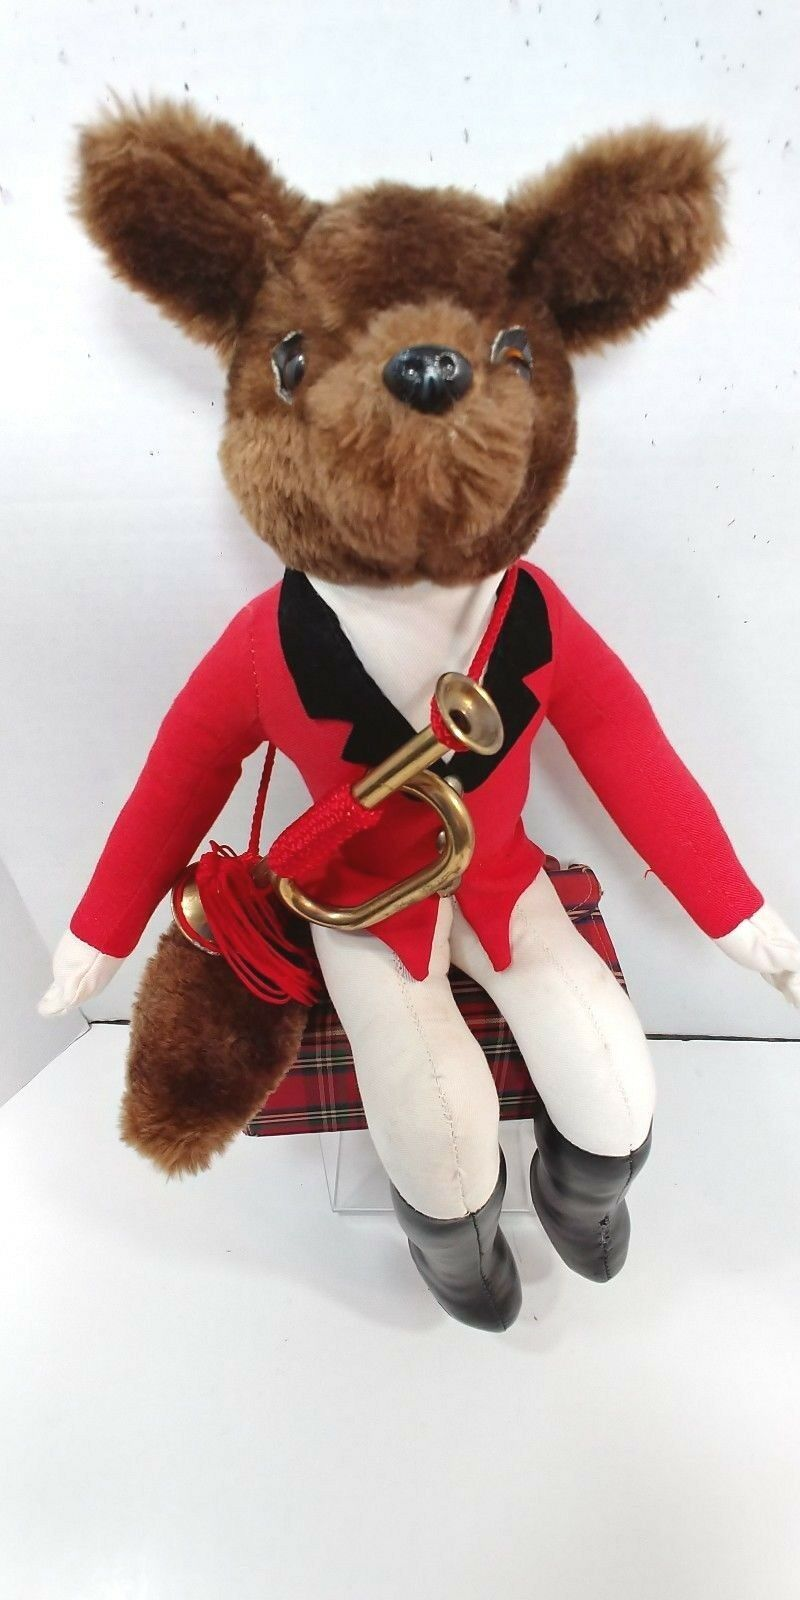 Sir Fox Hunt English Riding Brass Bugle Huntsman LG Stuff Animal Doll Hanford's